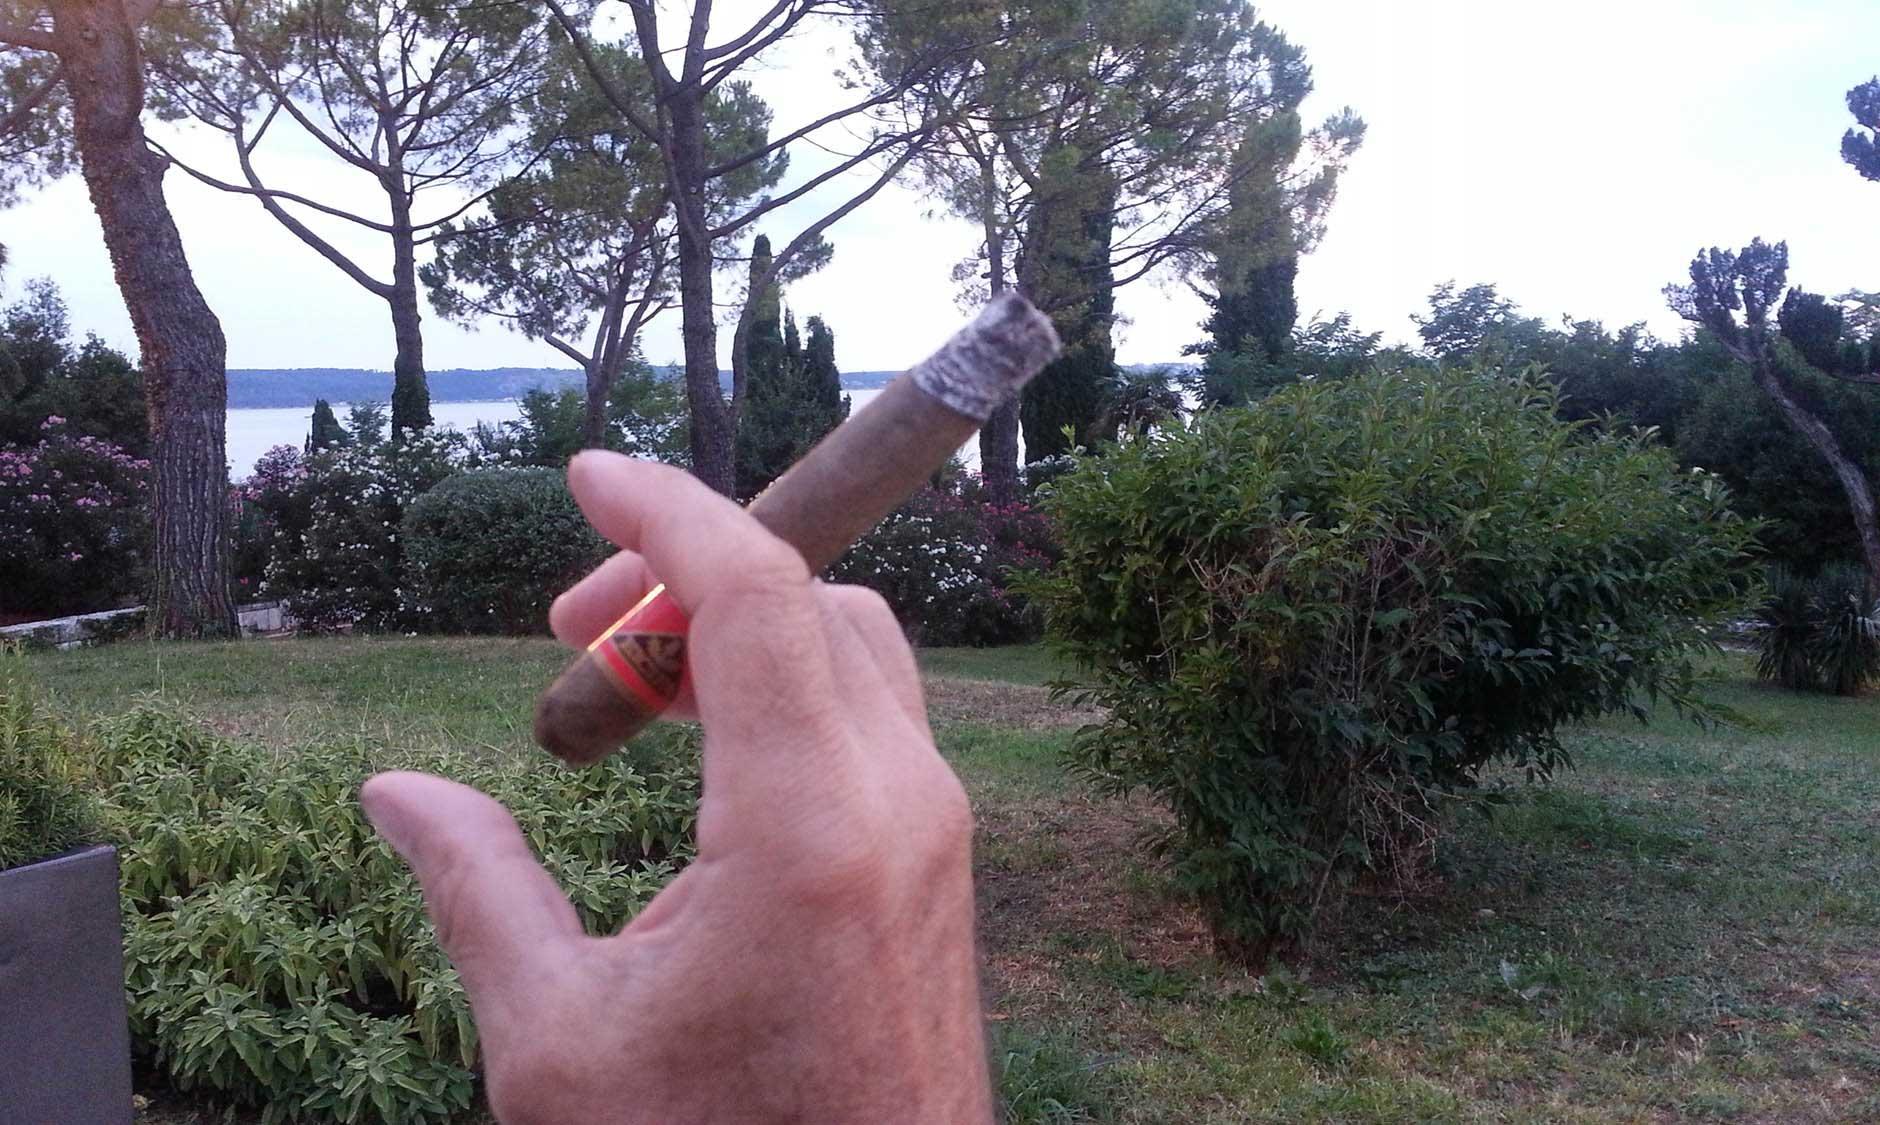 Eicifa-Cigarre in Portoroz in Slowenien unterwegs....M. Heim, Basel